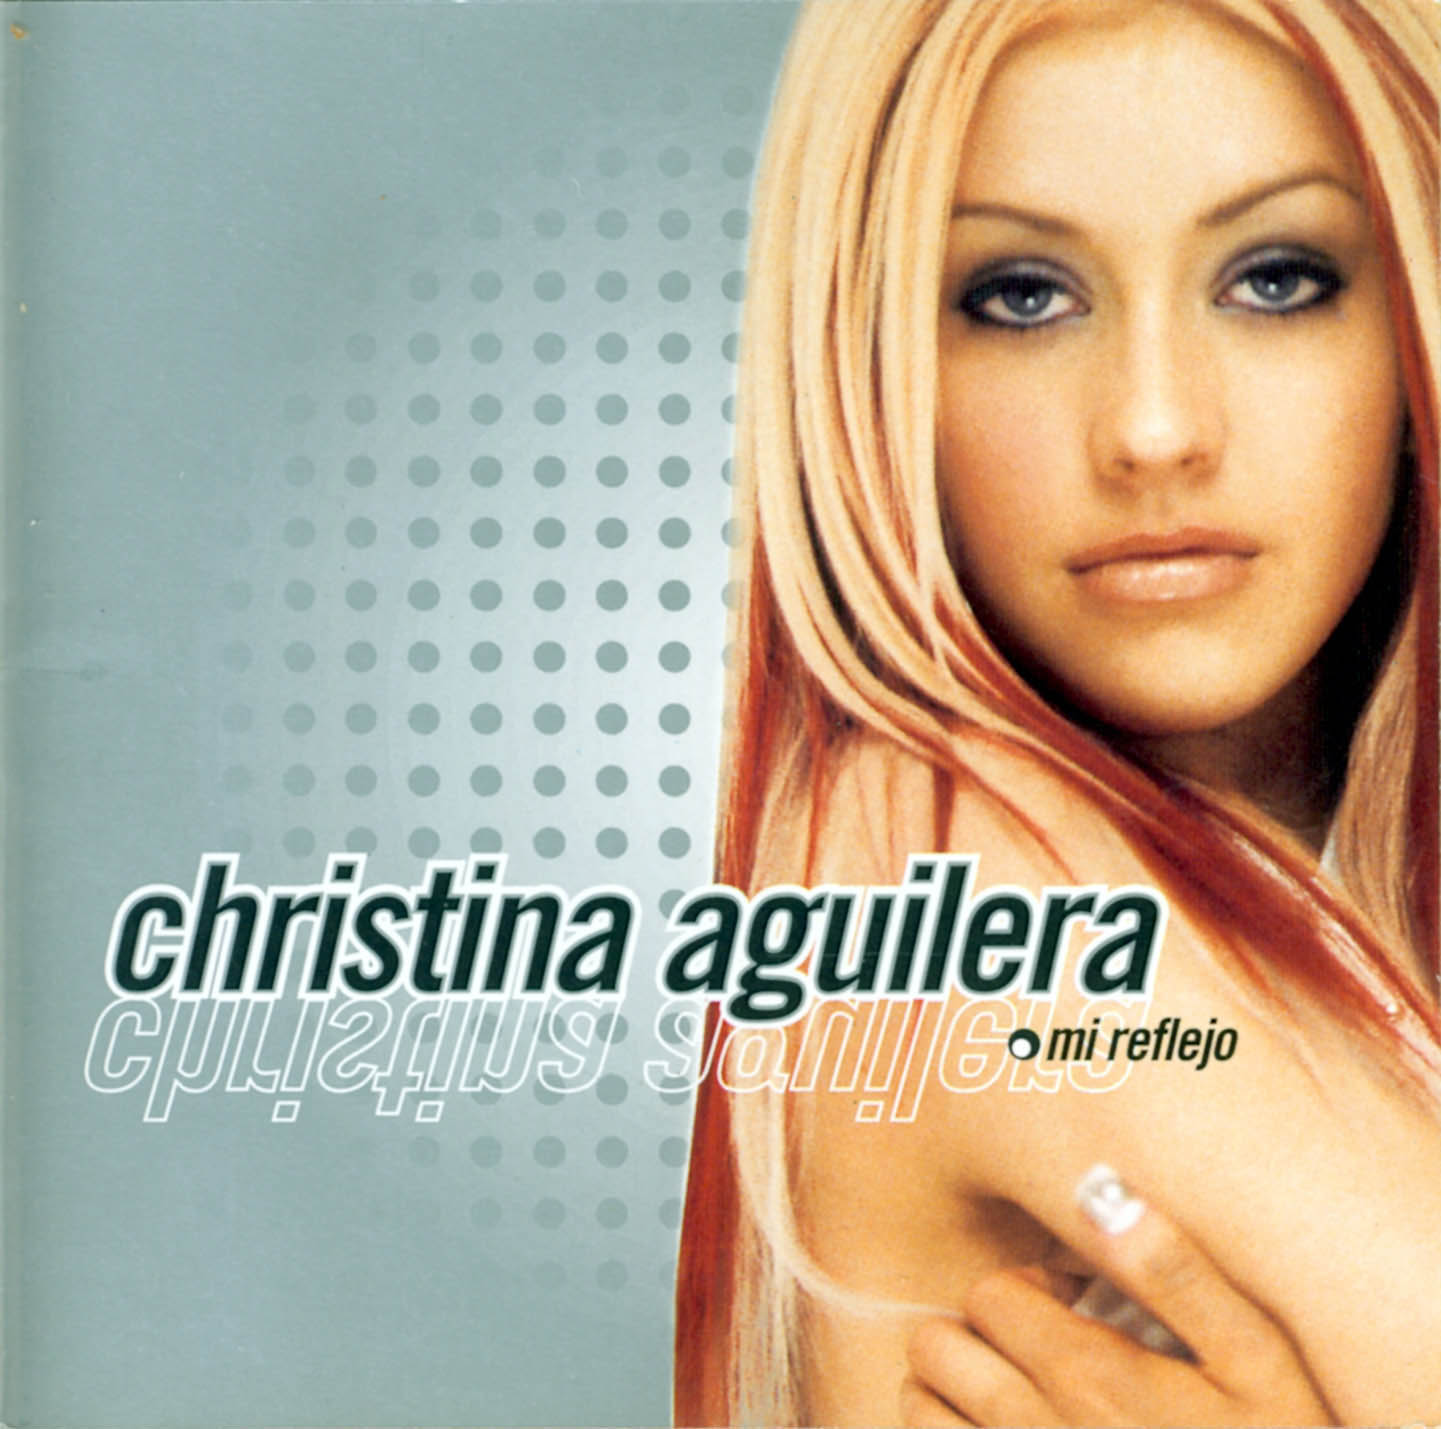 http://1.bp.blogspot.com/-uk20yVTWw18/TvSYGu-EV0I/AAAAAAAAA9g/OHnXZqqg-Jo/s1600/Christina_Aguilera-Mi_Reflejo-Frontal.jpg